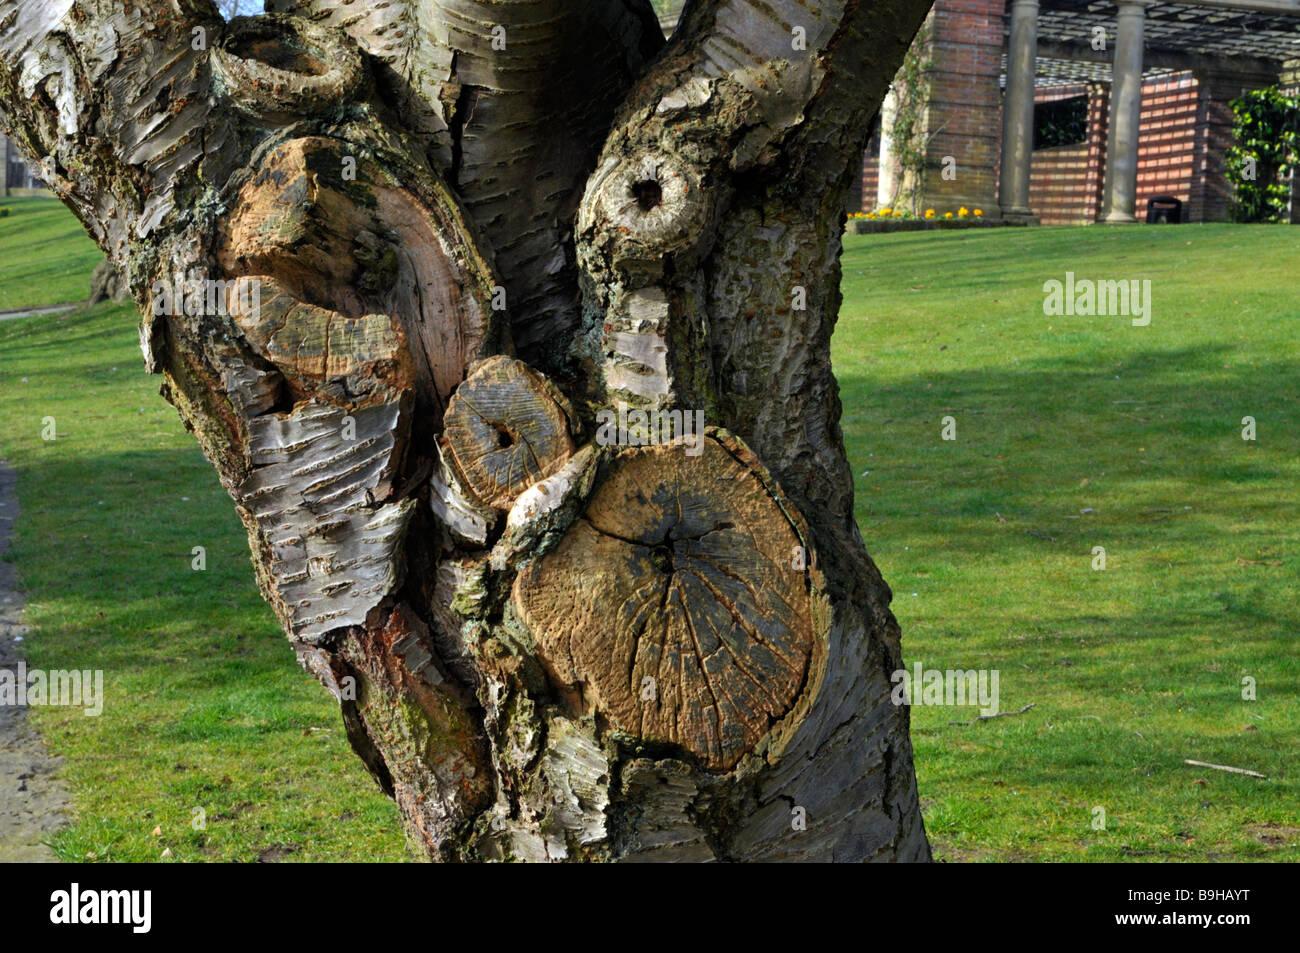 gnarled tree in valley gardens, harrogate - Stock Image